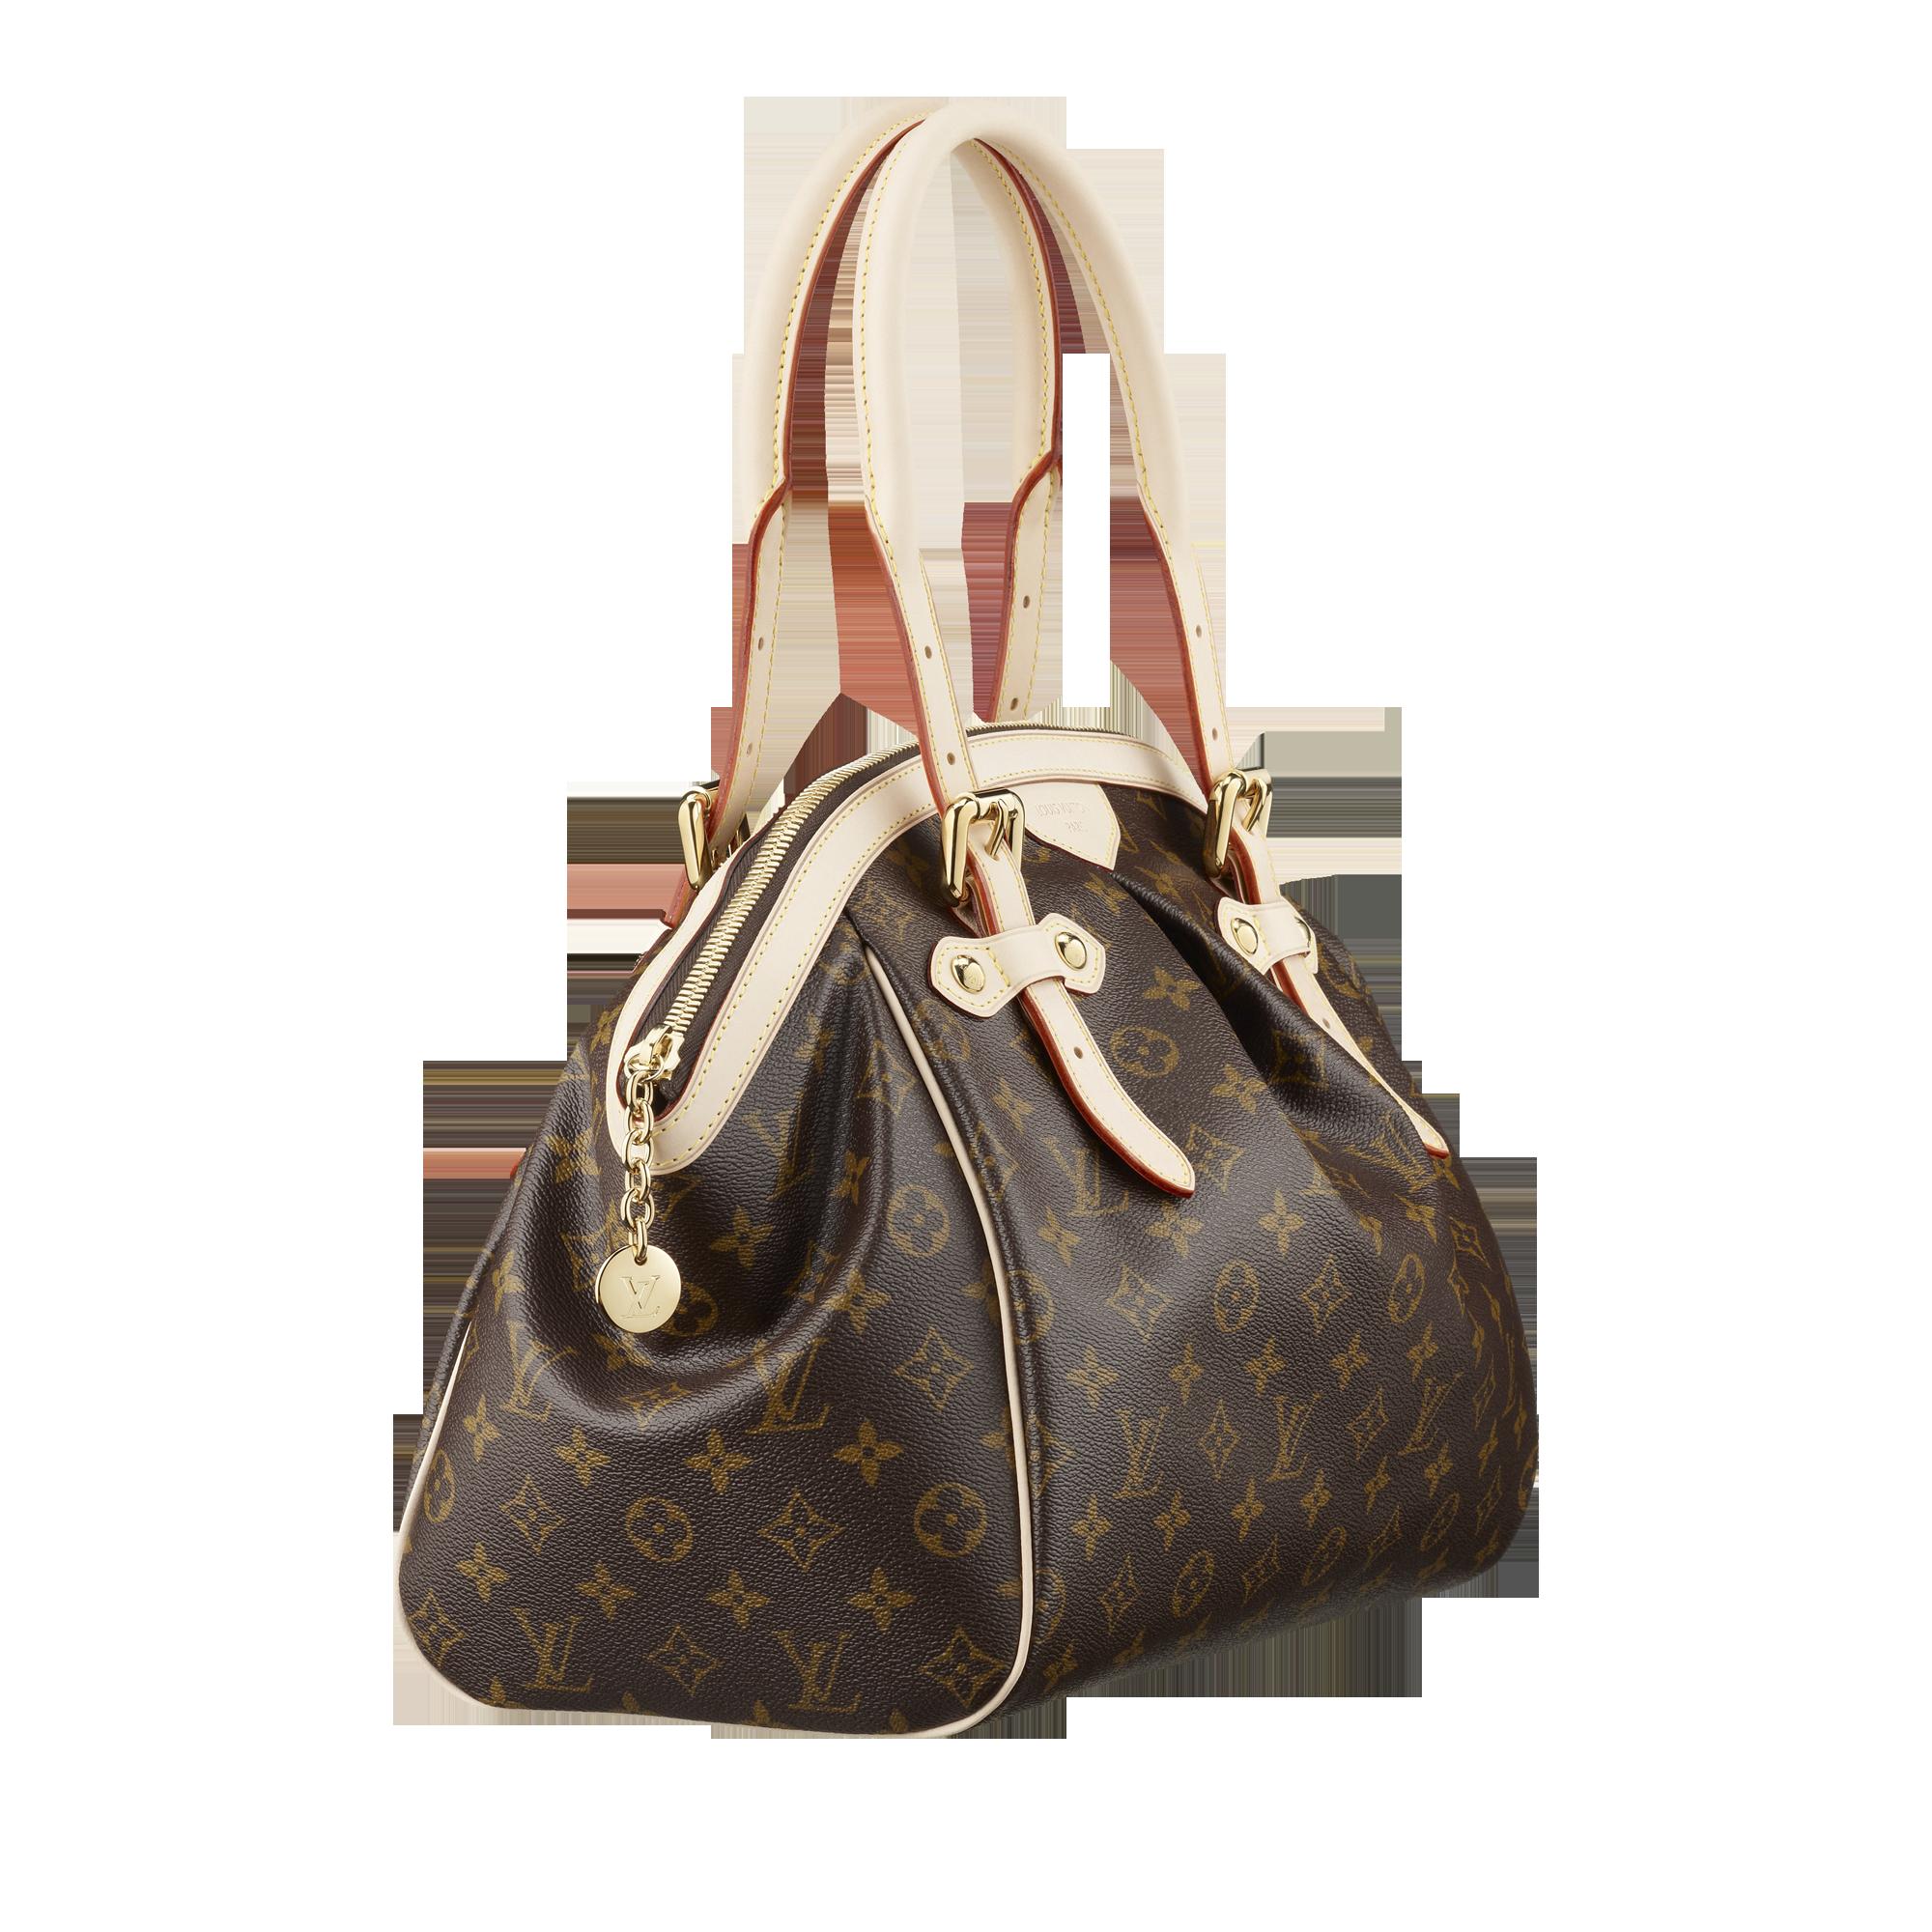 Louis Vuitton Women bag PNG image - Purse PNG